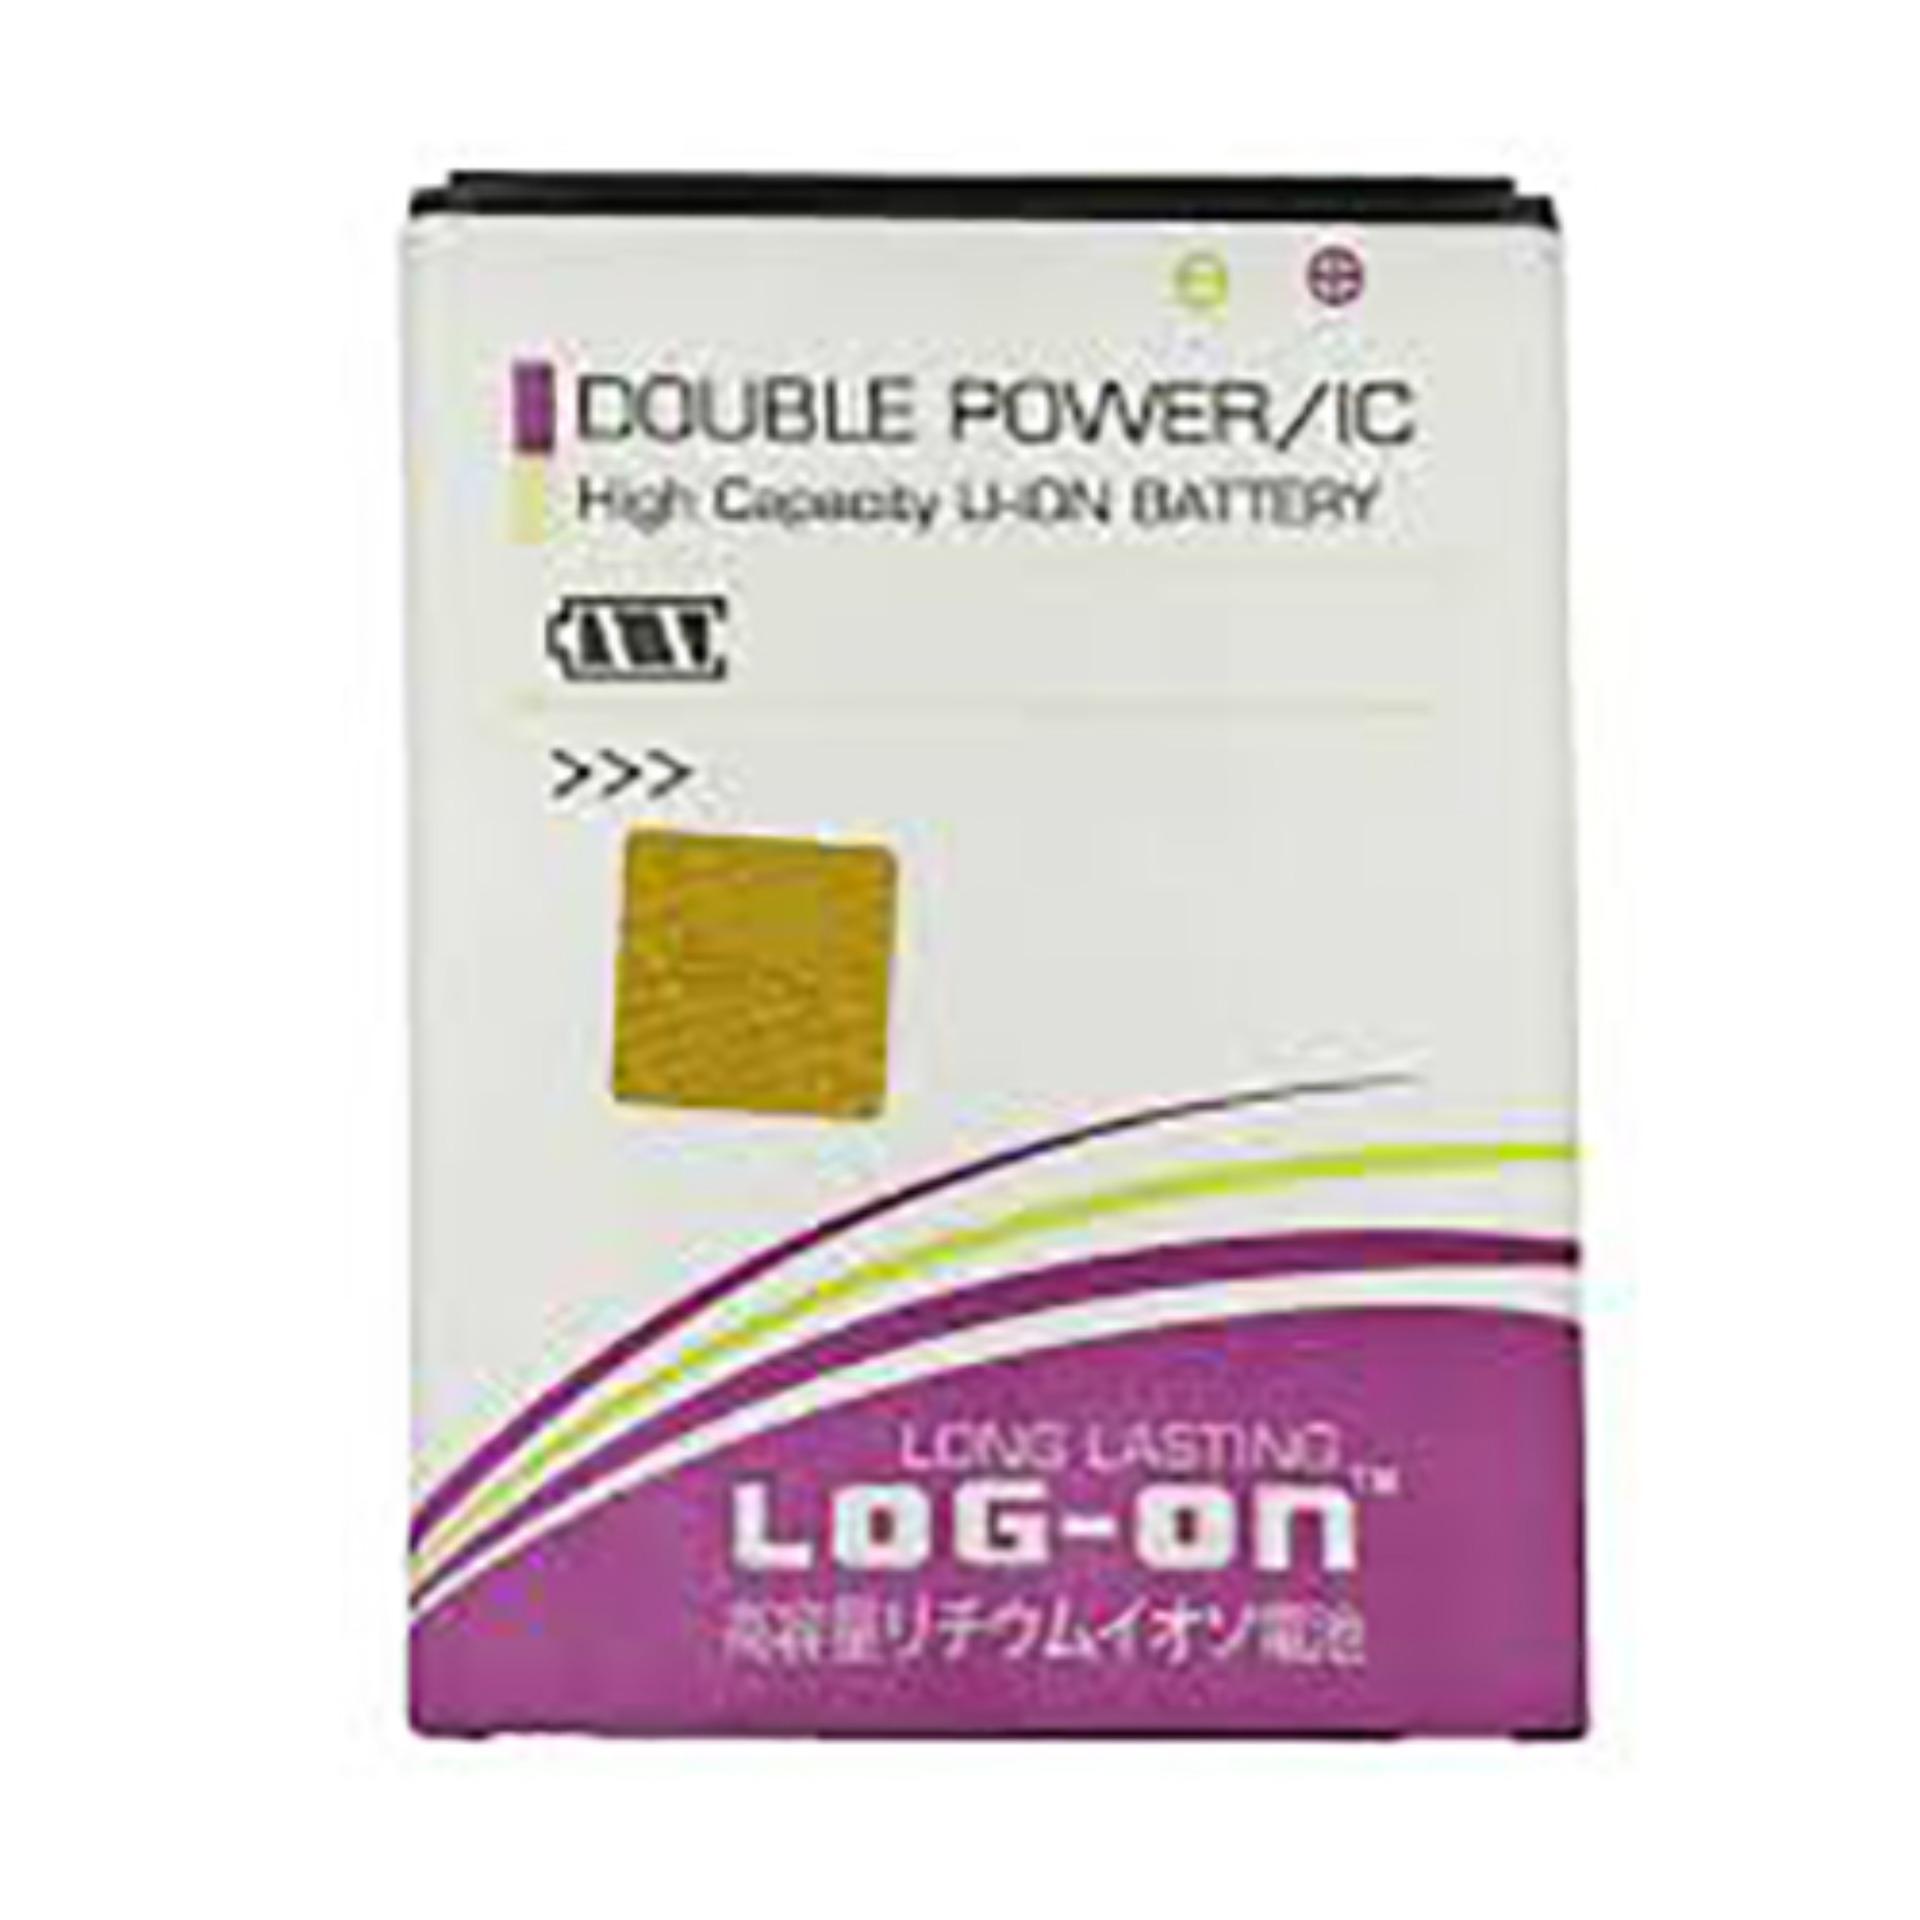 LOG-ON Battery FOR Acer Liquid E700 4000mAh - Double Power & IC Battery